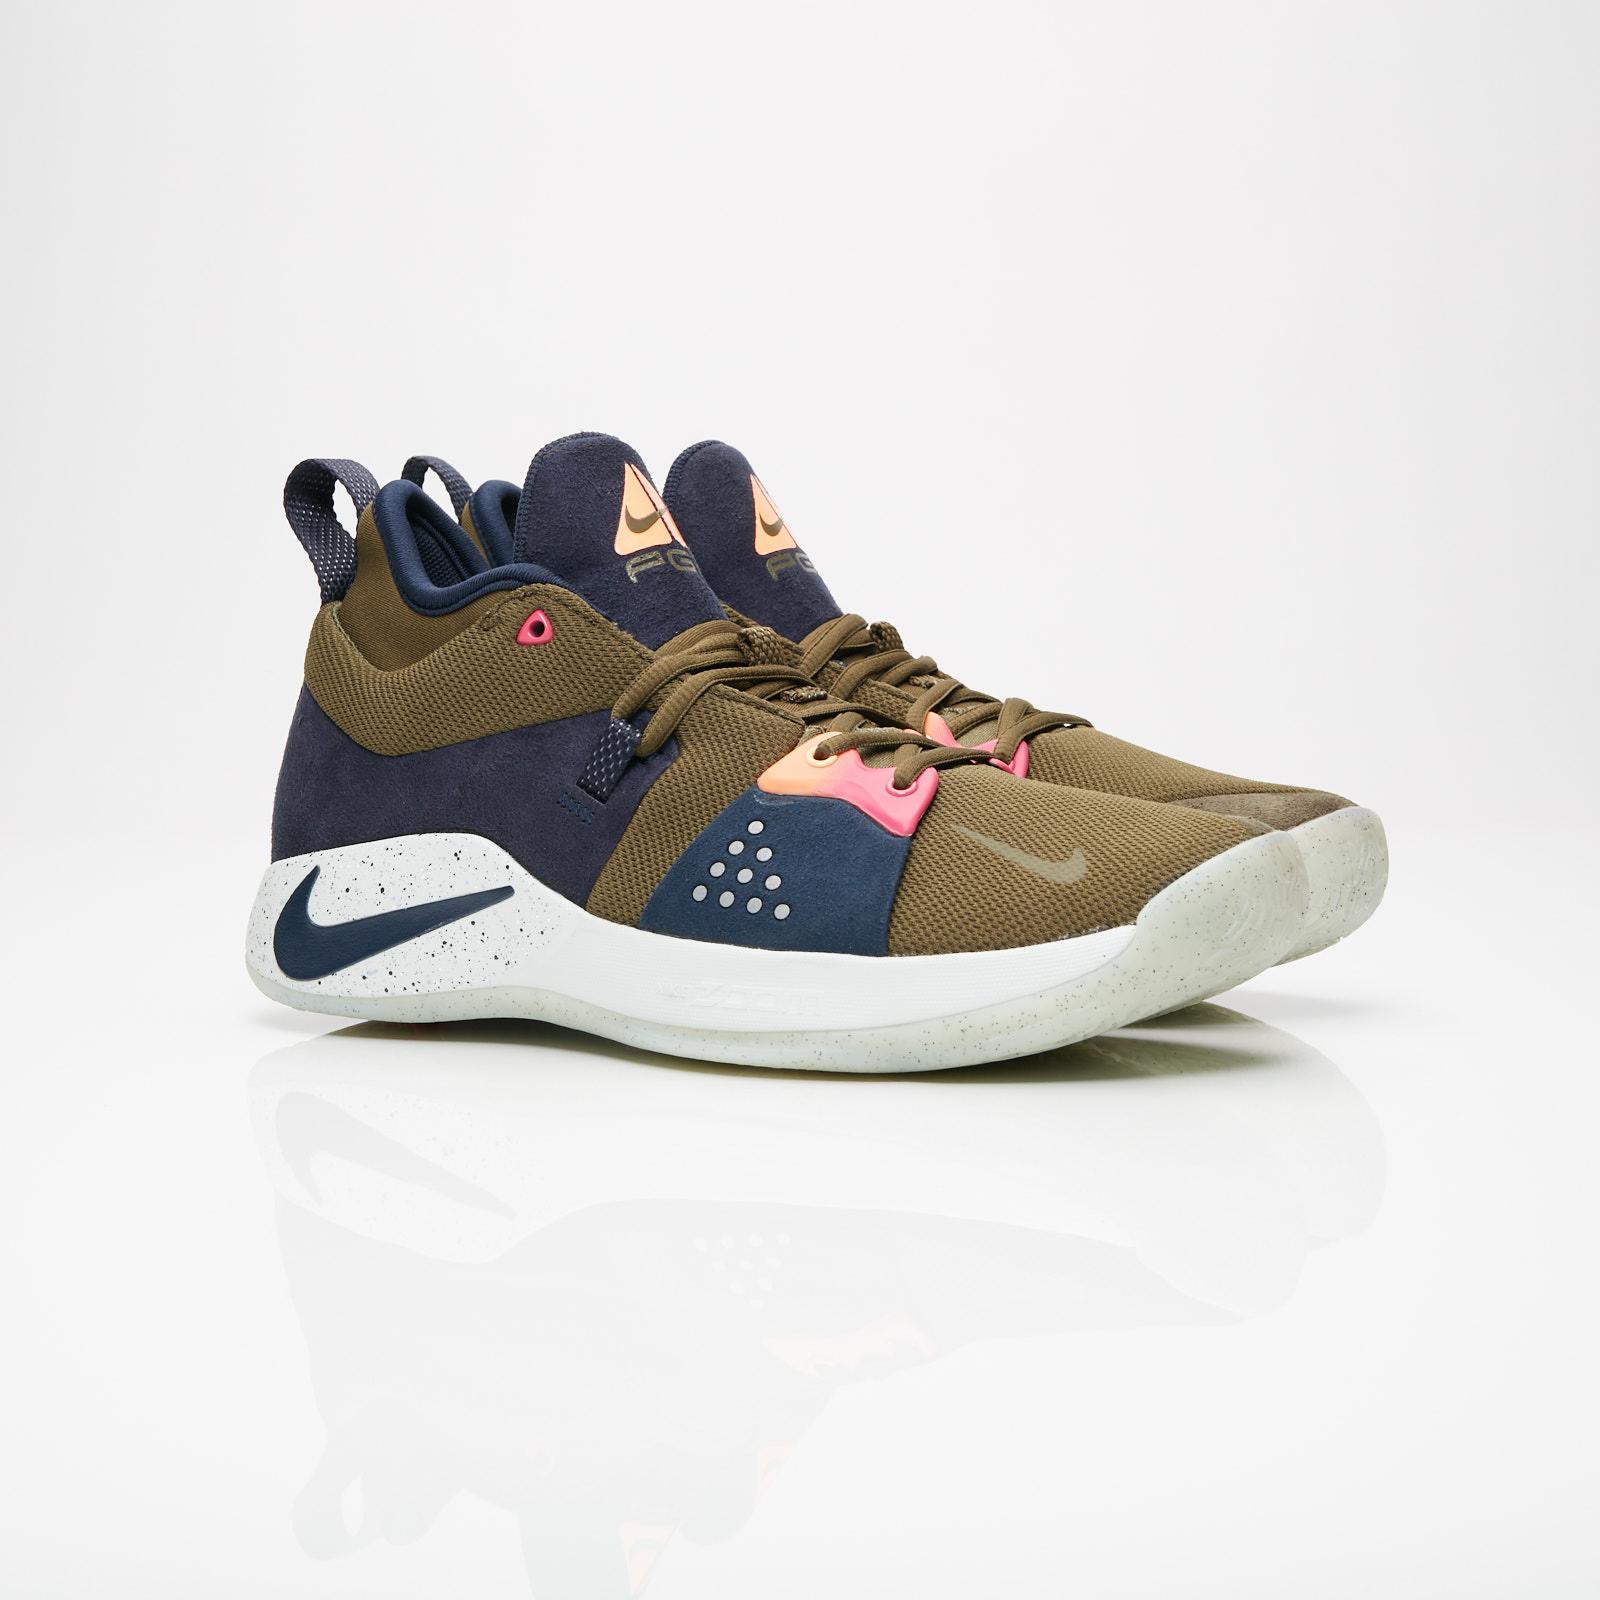 2ed35f9ae8e Nike PG 2 - Aj2039-300 - Sneakersnstuff